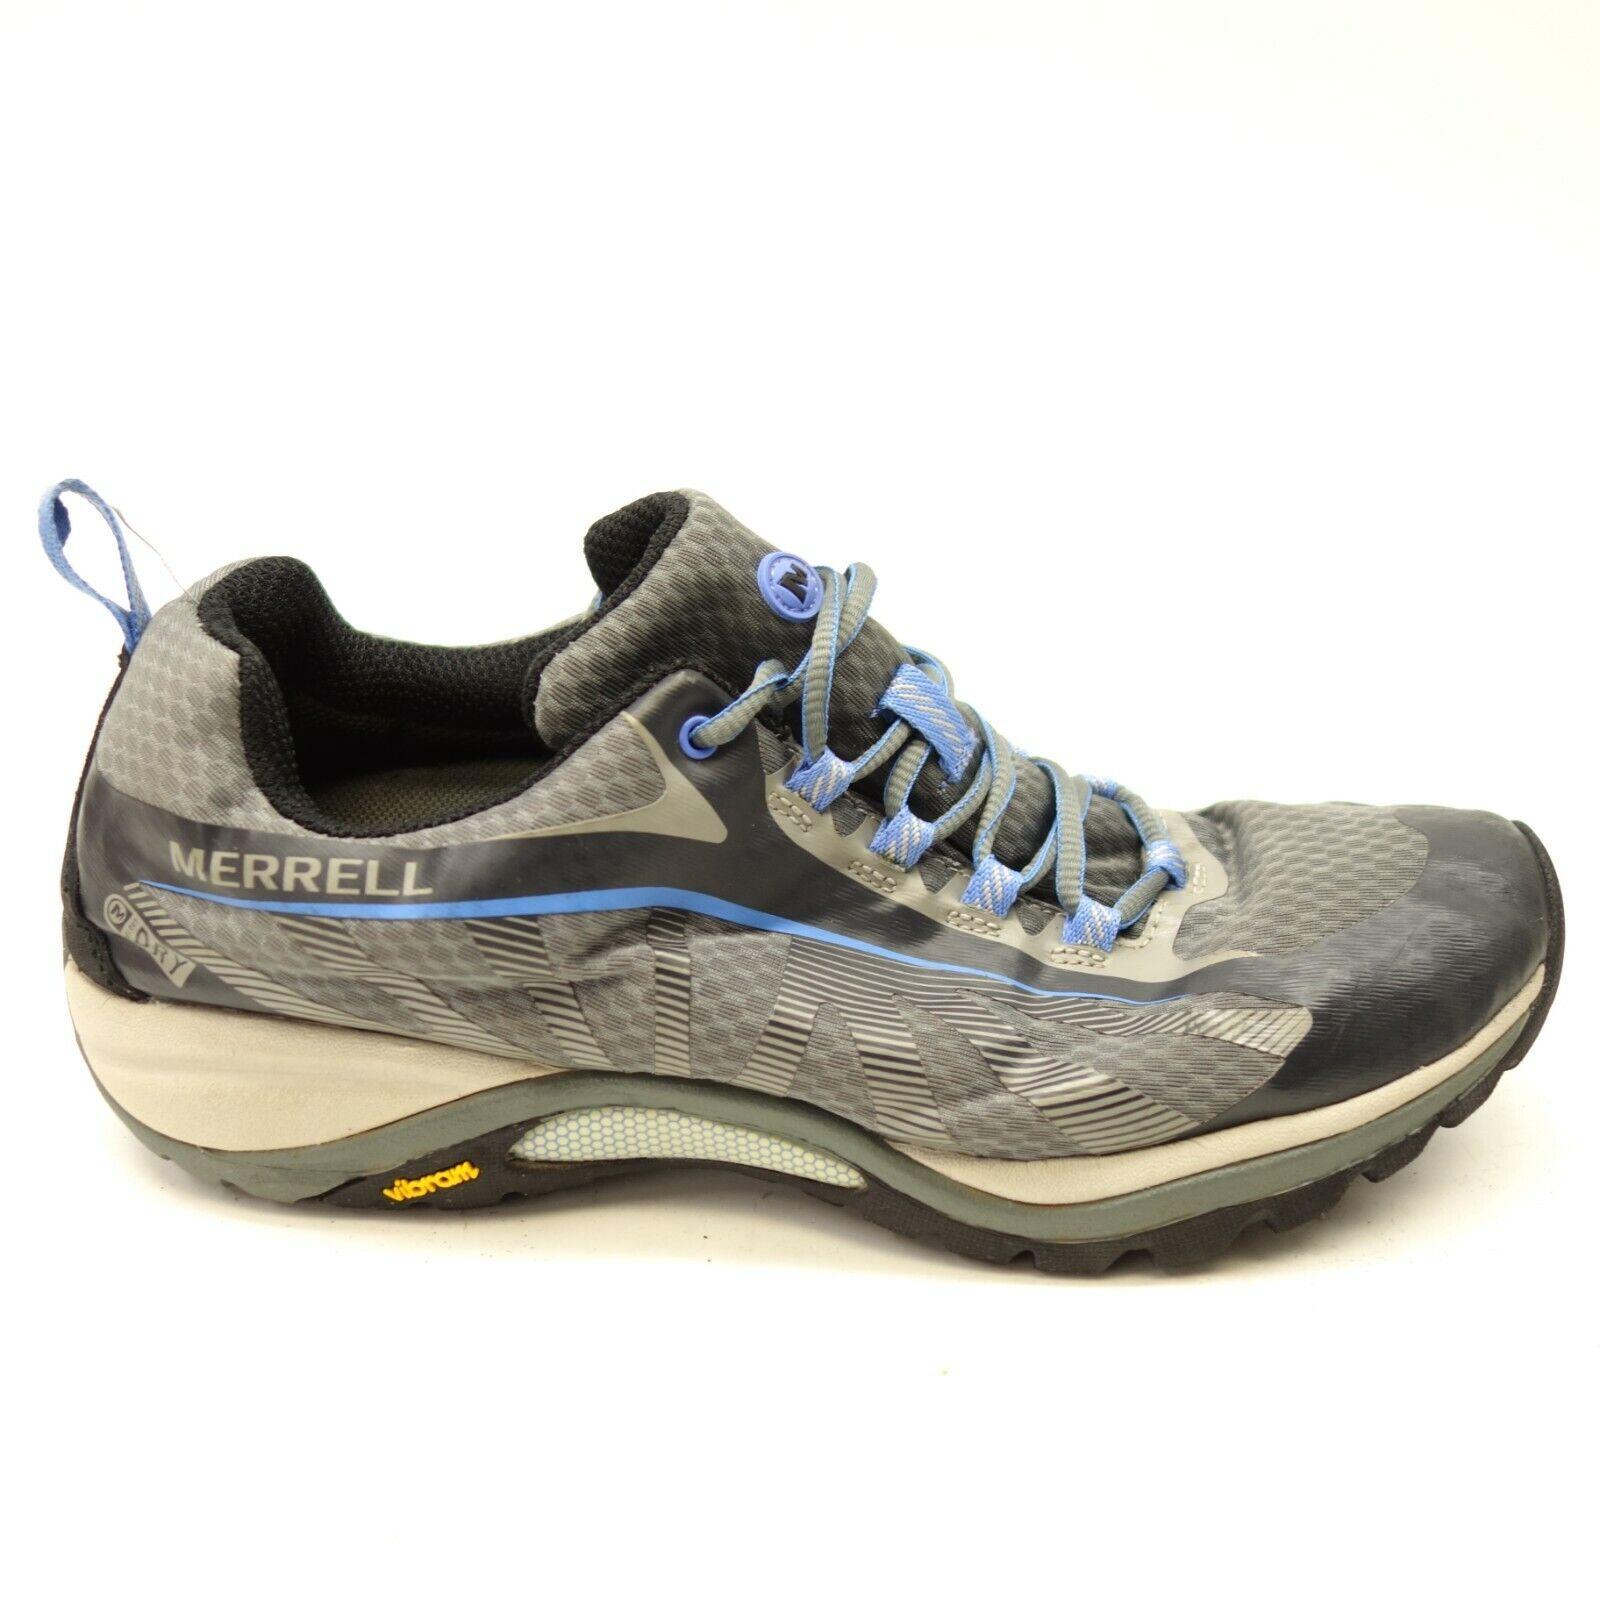 Merrell donna Siren Edge Waterproof Vibram Athletic Trail Hiking scarpe Dimensione 10